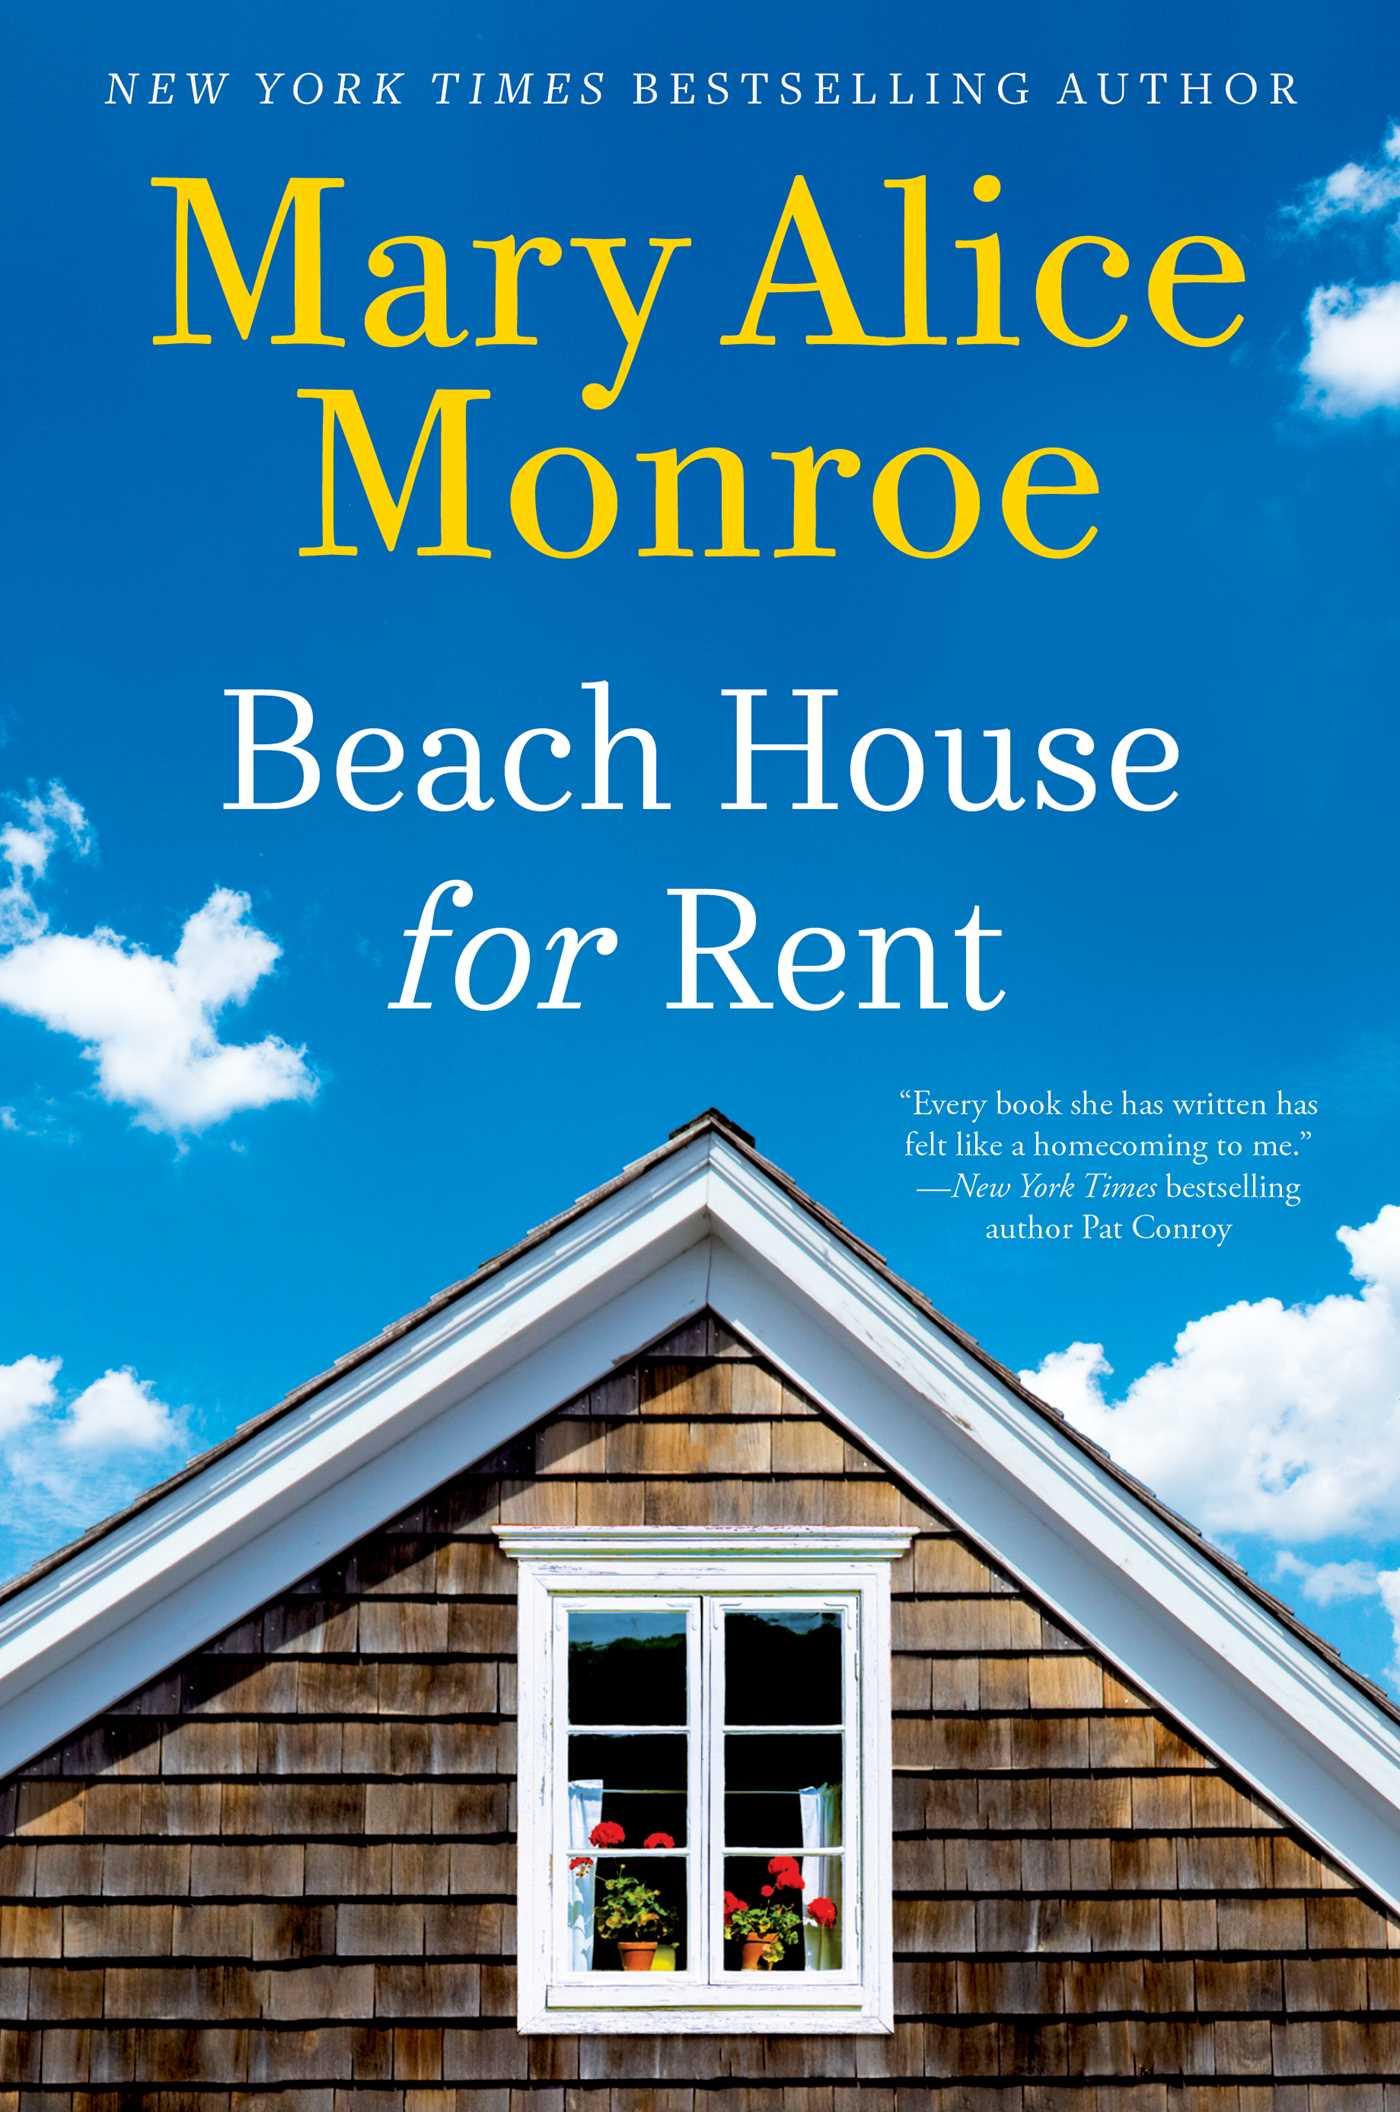 Beach house for rent 9781501125461 hr